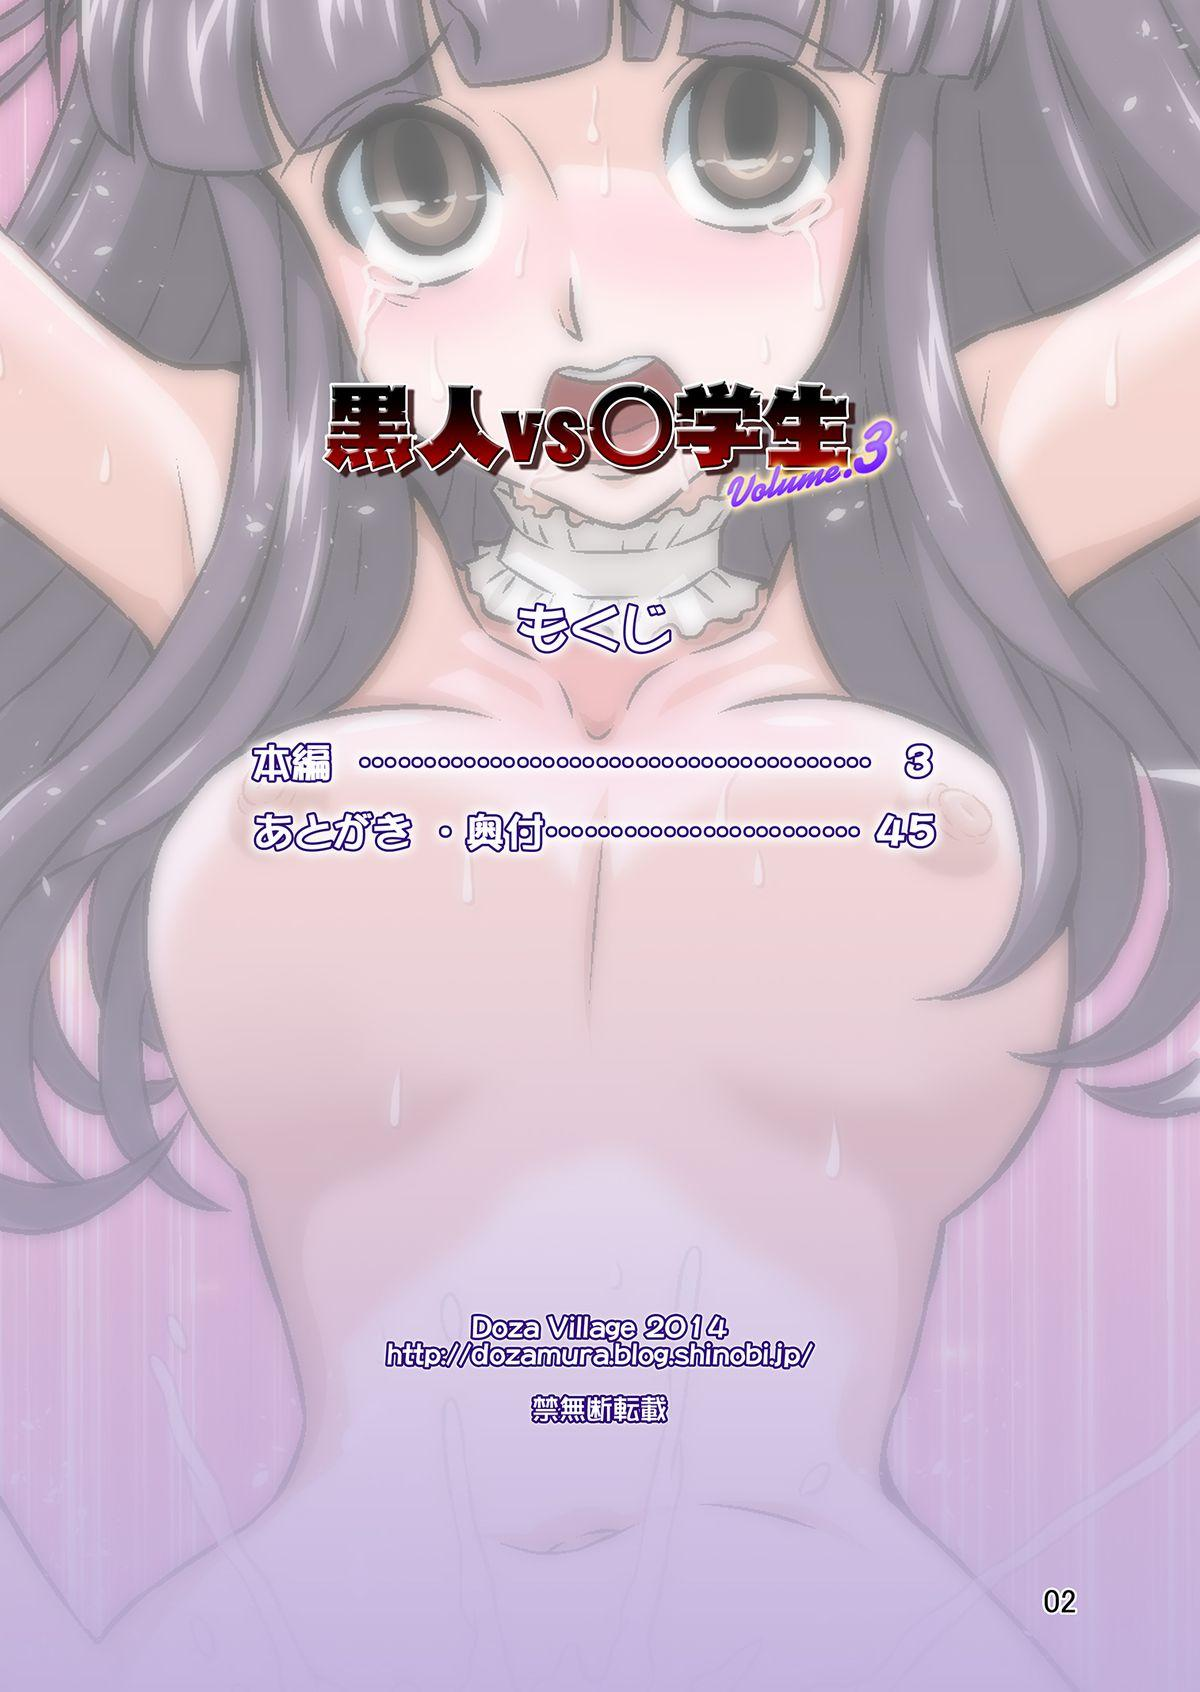 Kokujin VS Shougakusei Vol. 3 1